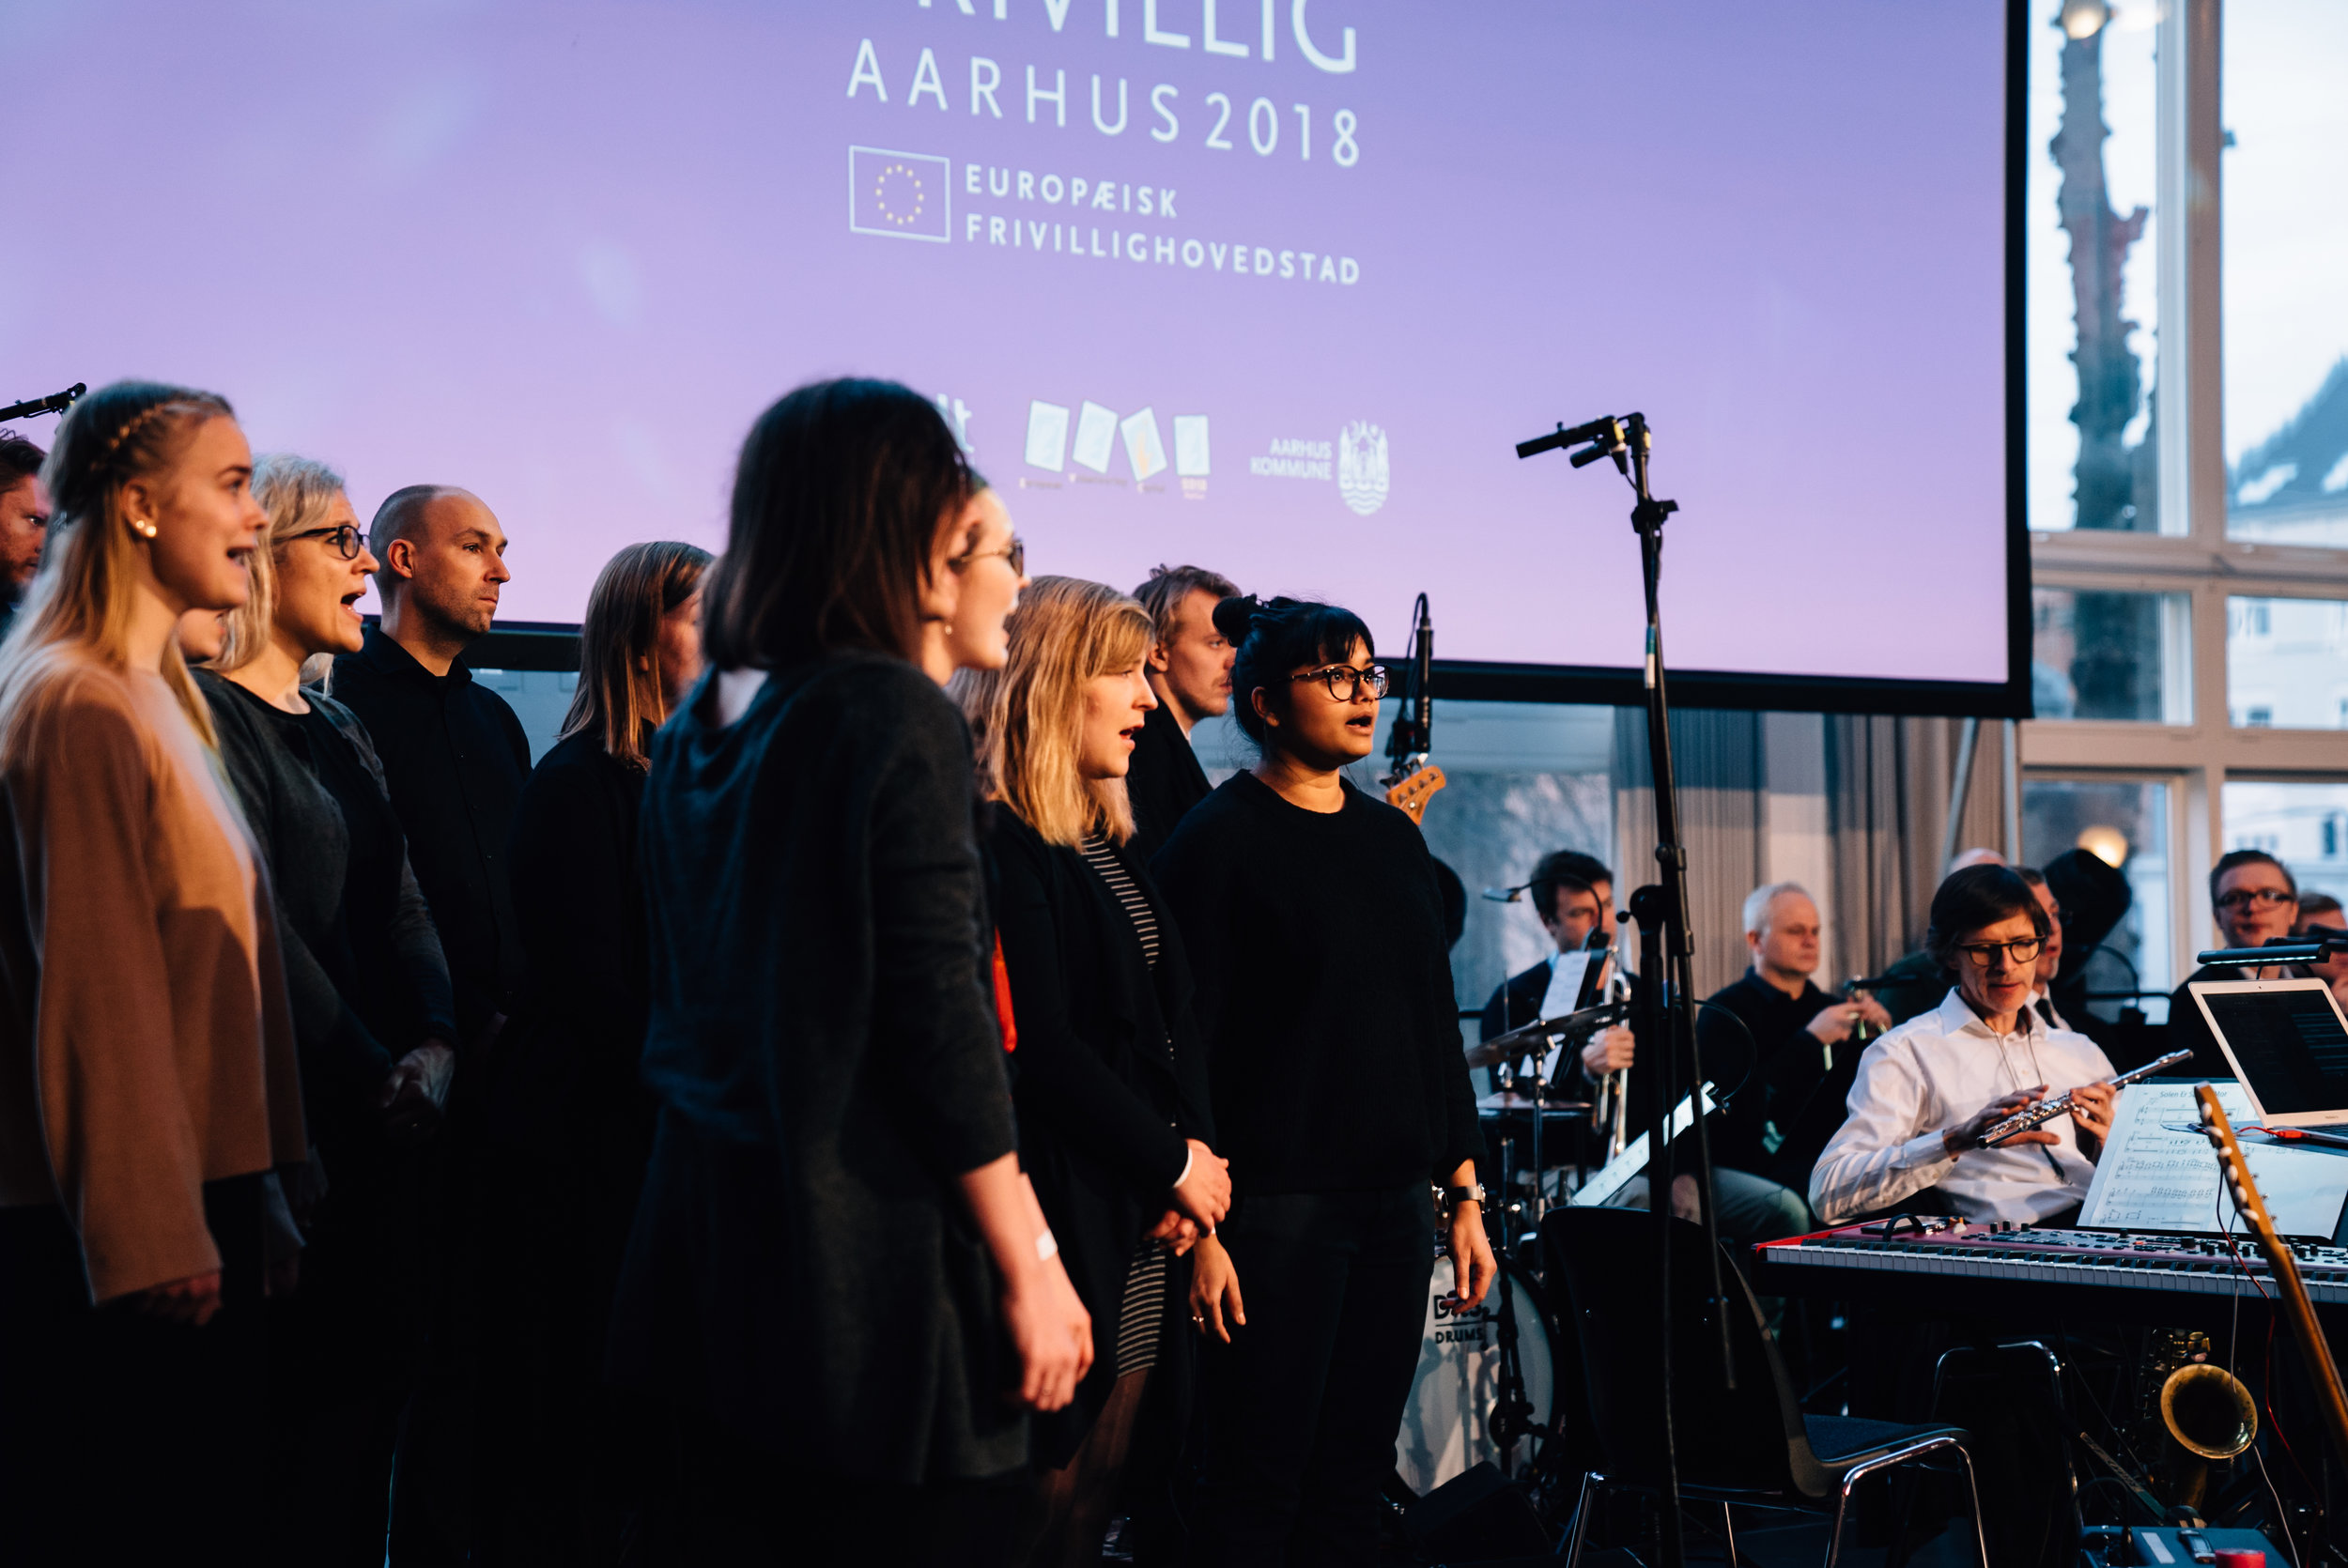 Aarhus Jazz Orchestra Aarhus 2018 - Europæisk Kulturhovedstad